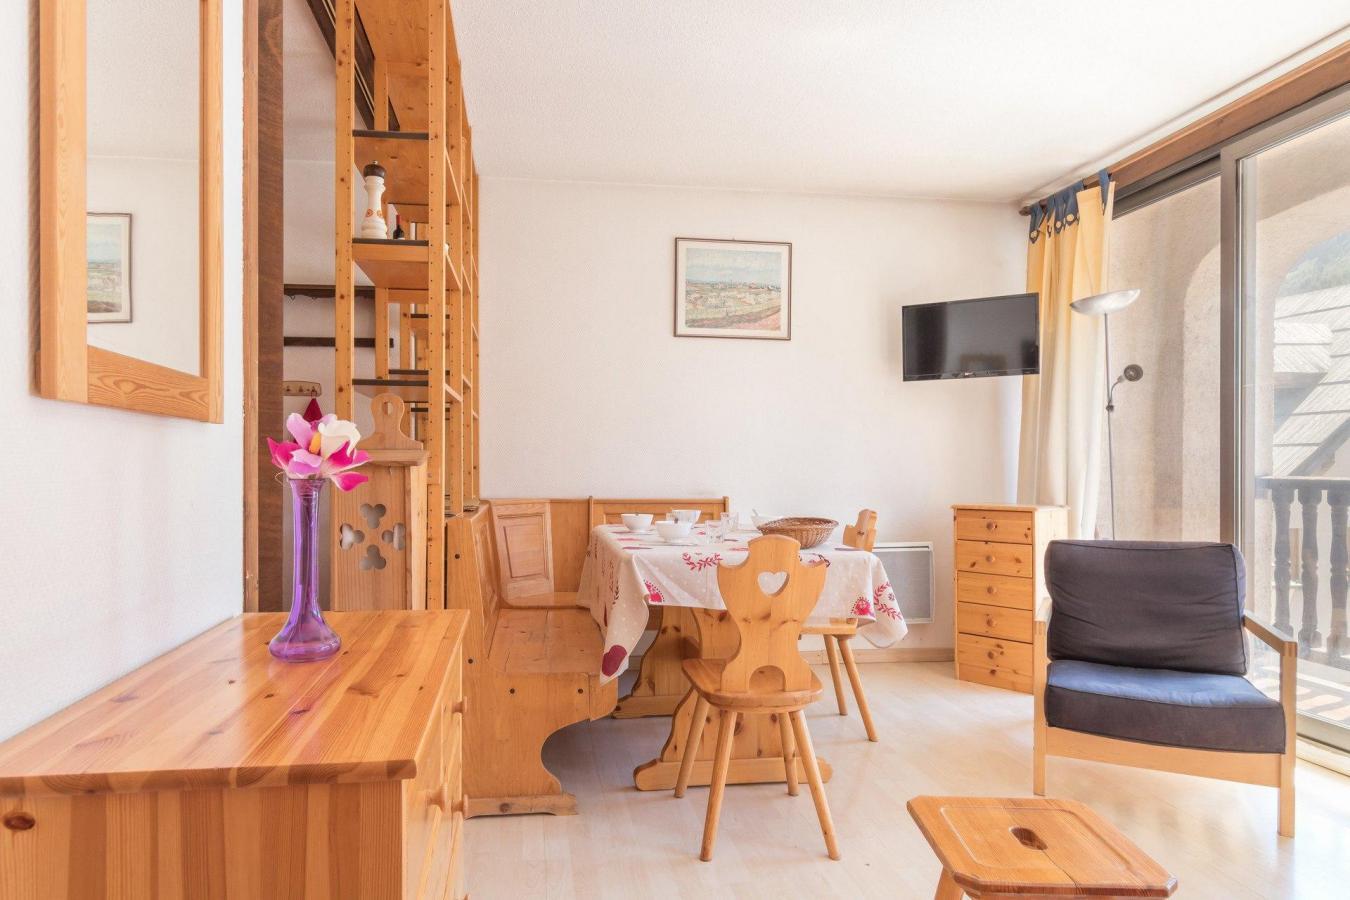 Accommodation Residence Les Bardeaux